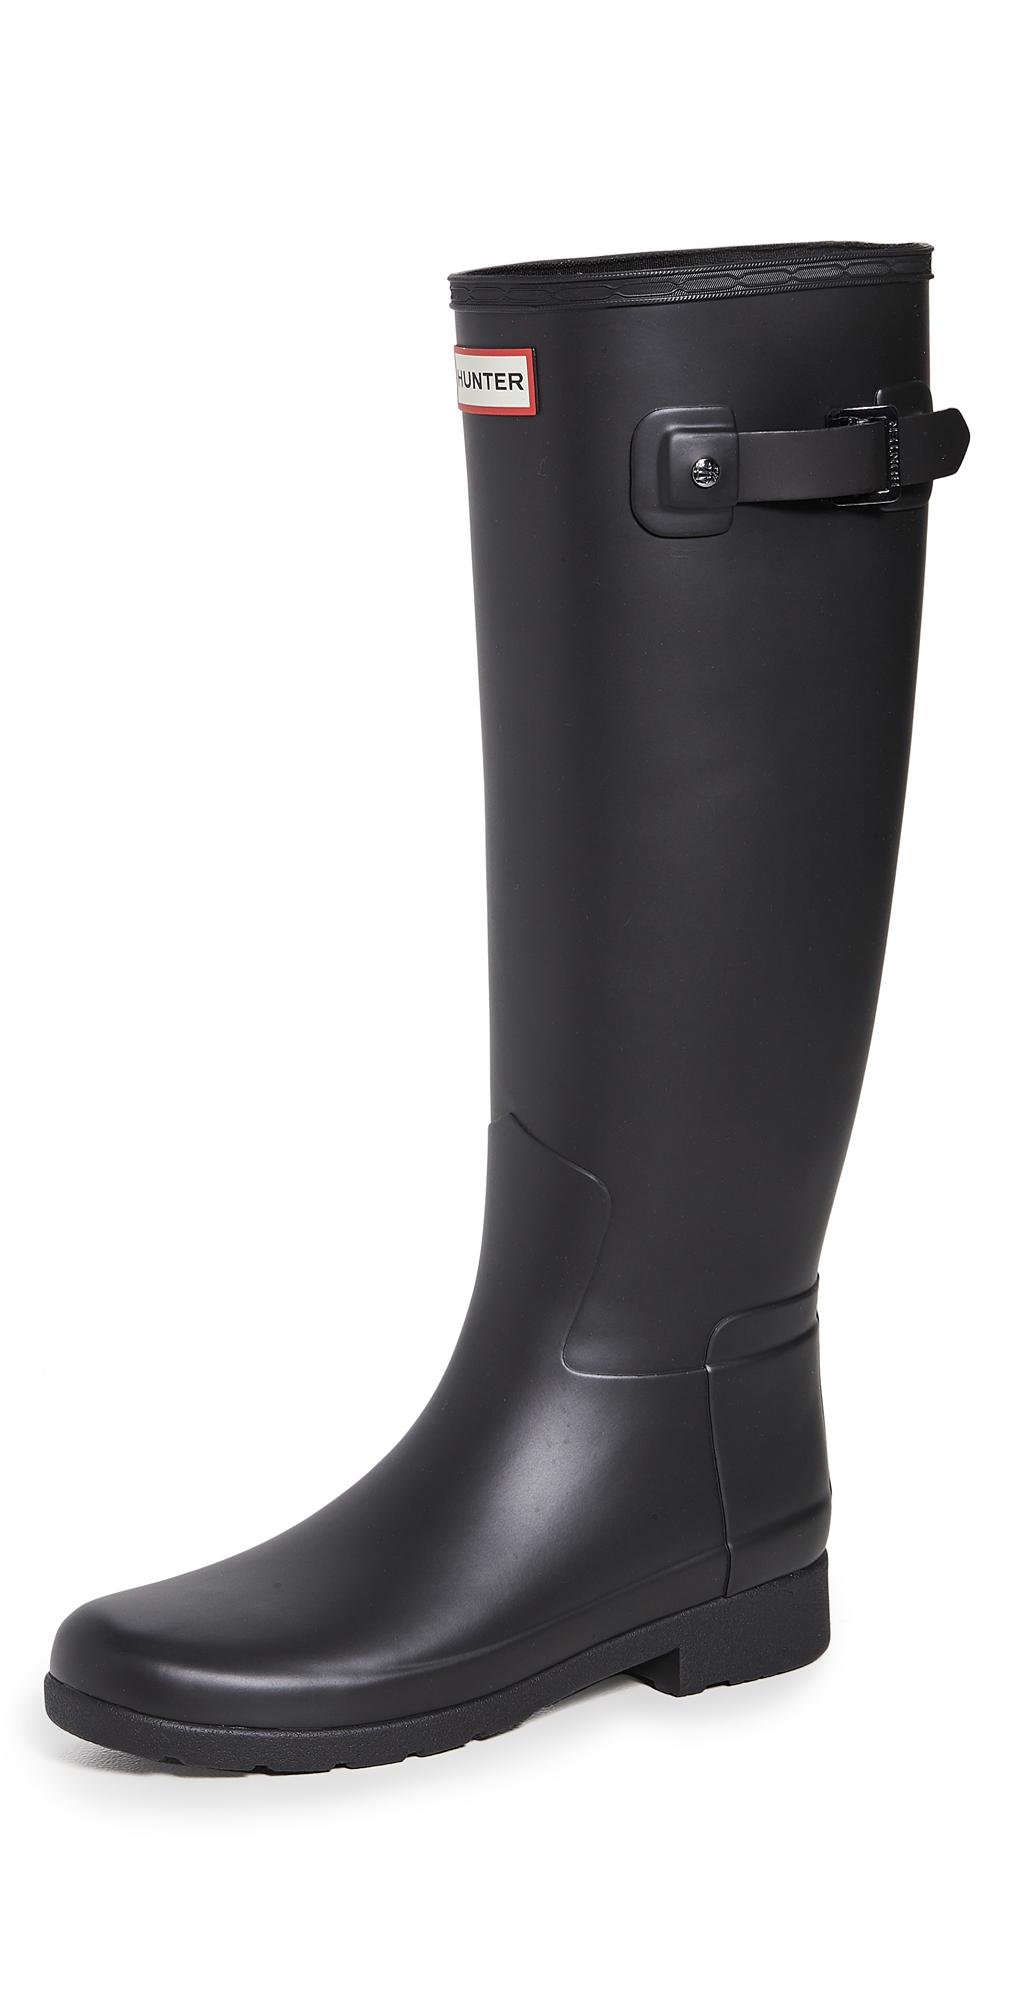 Refined Tall Matte Boots